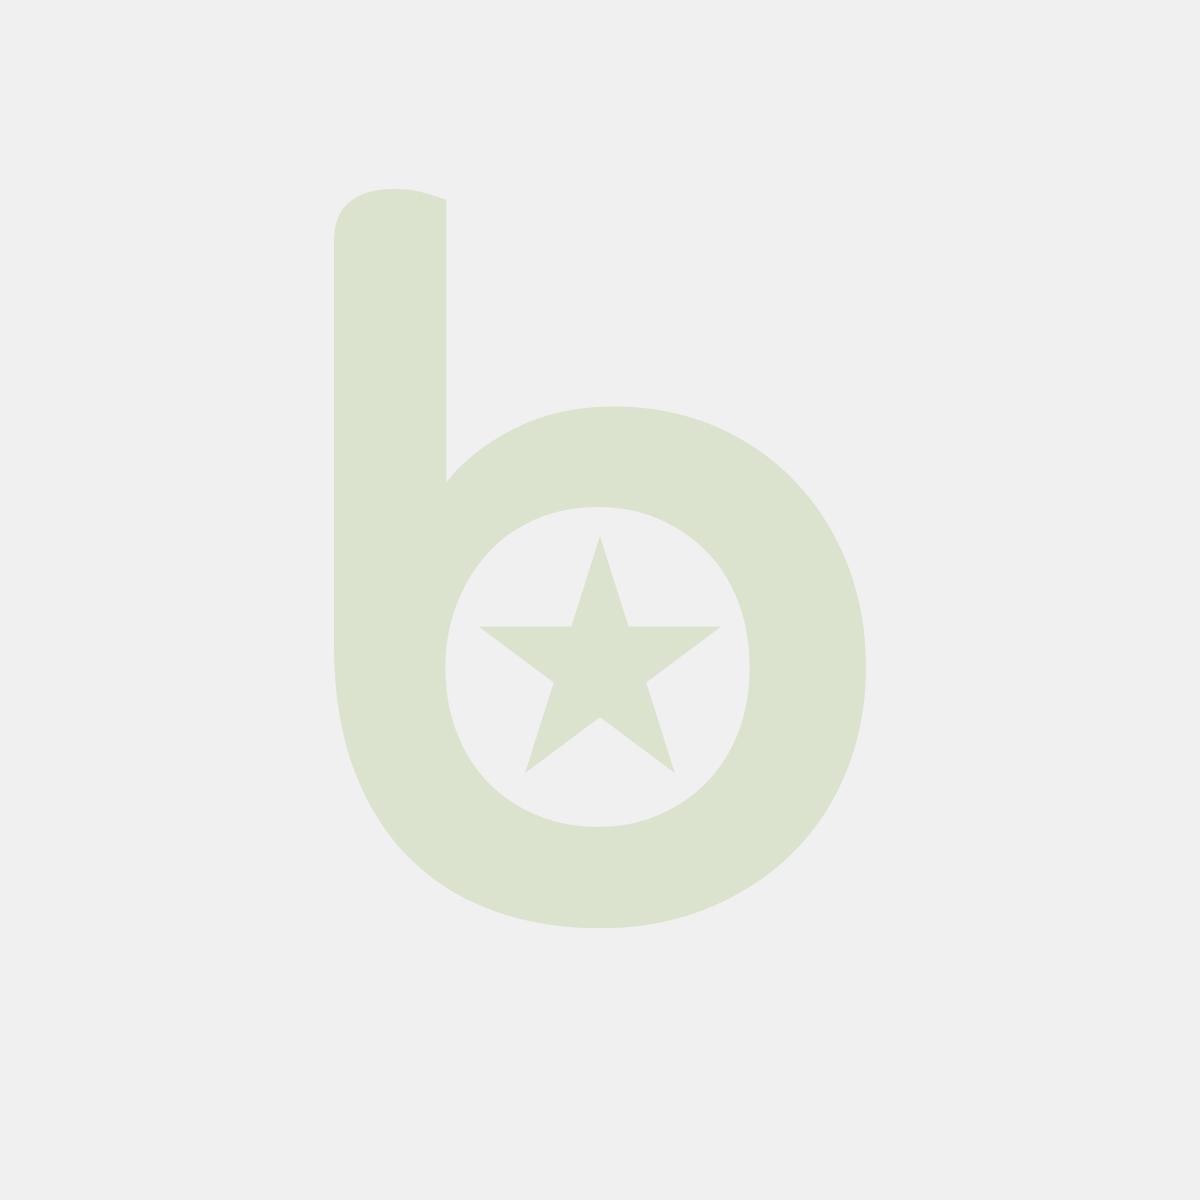 Koperty samoklejące (SK) NC, 50 sztuk, białe, C6, 14030/50/11021000